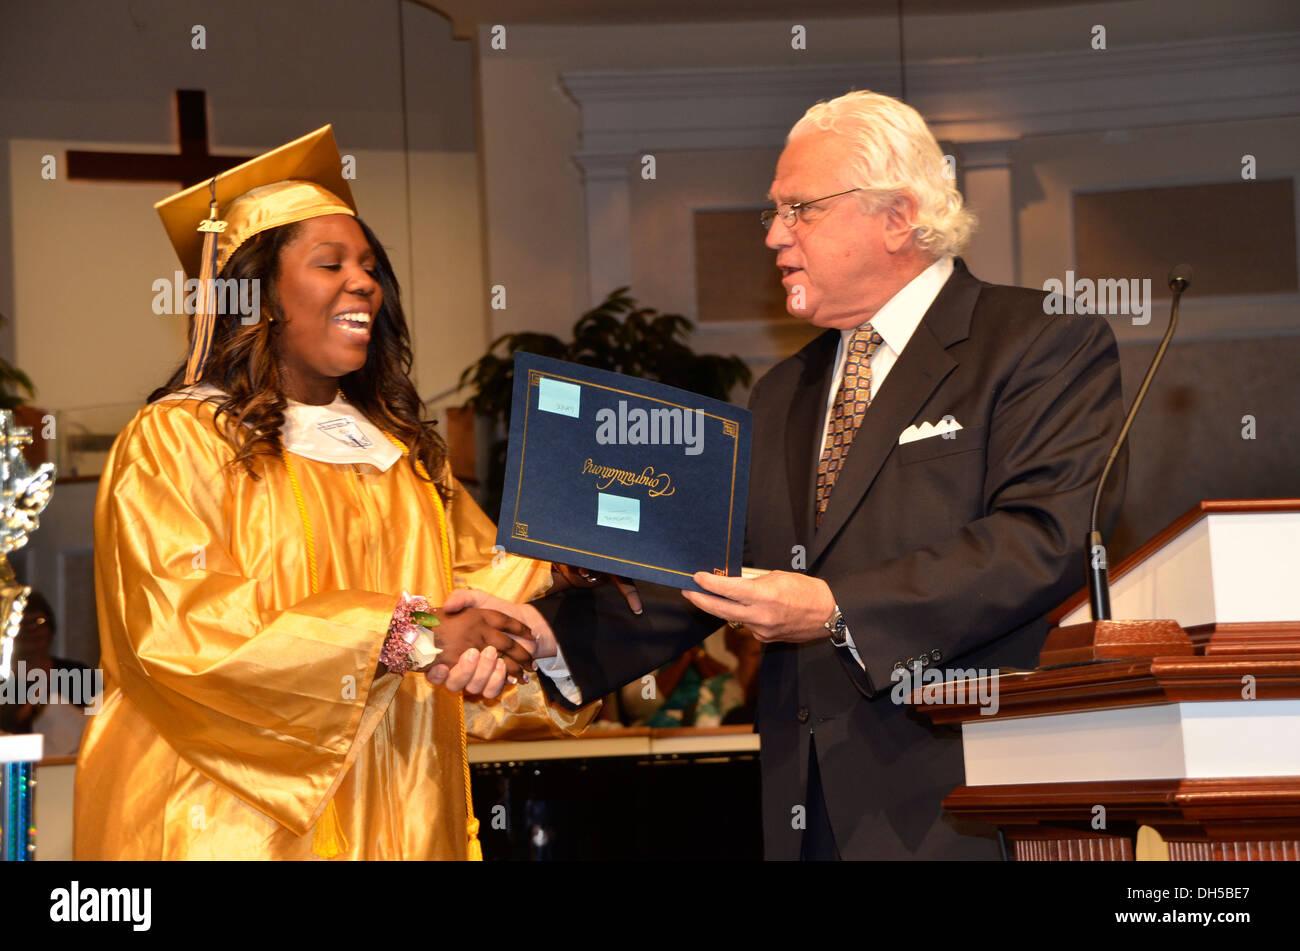 Maryland Senator Michael Miller present a diploma to a graduating student at a high school graduation, - Stock Image